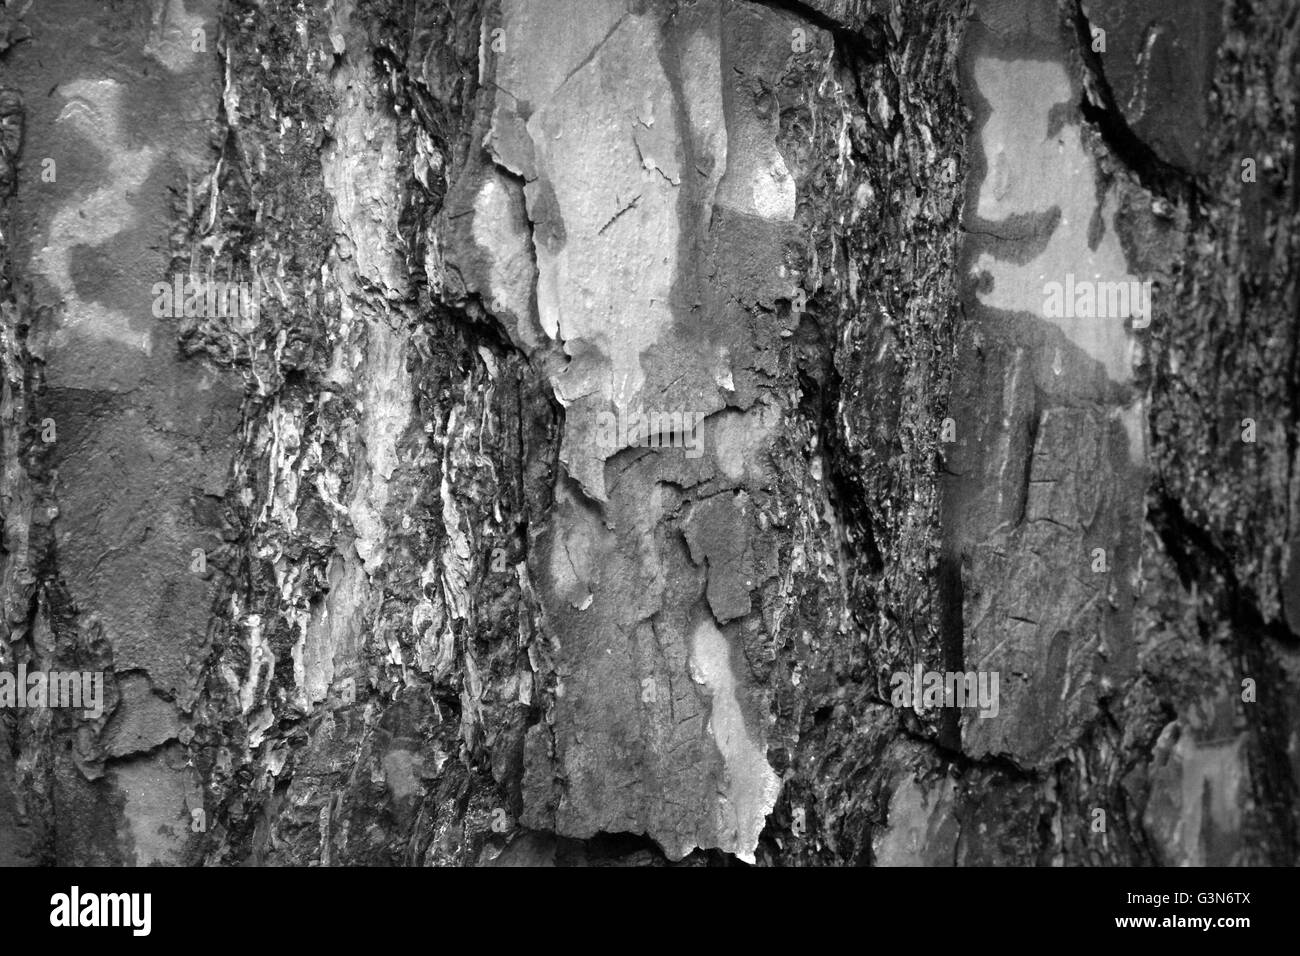 Macro Bark in Black and White - Stock Image